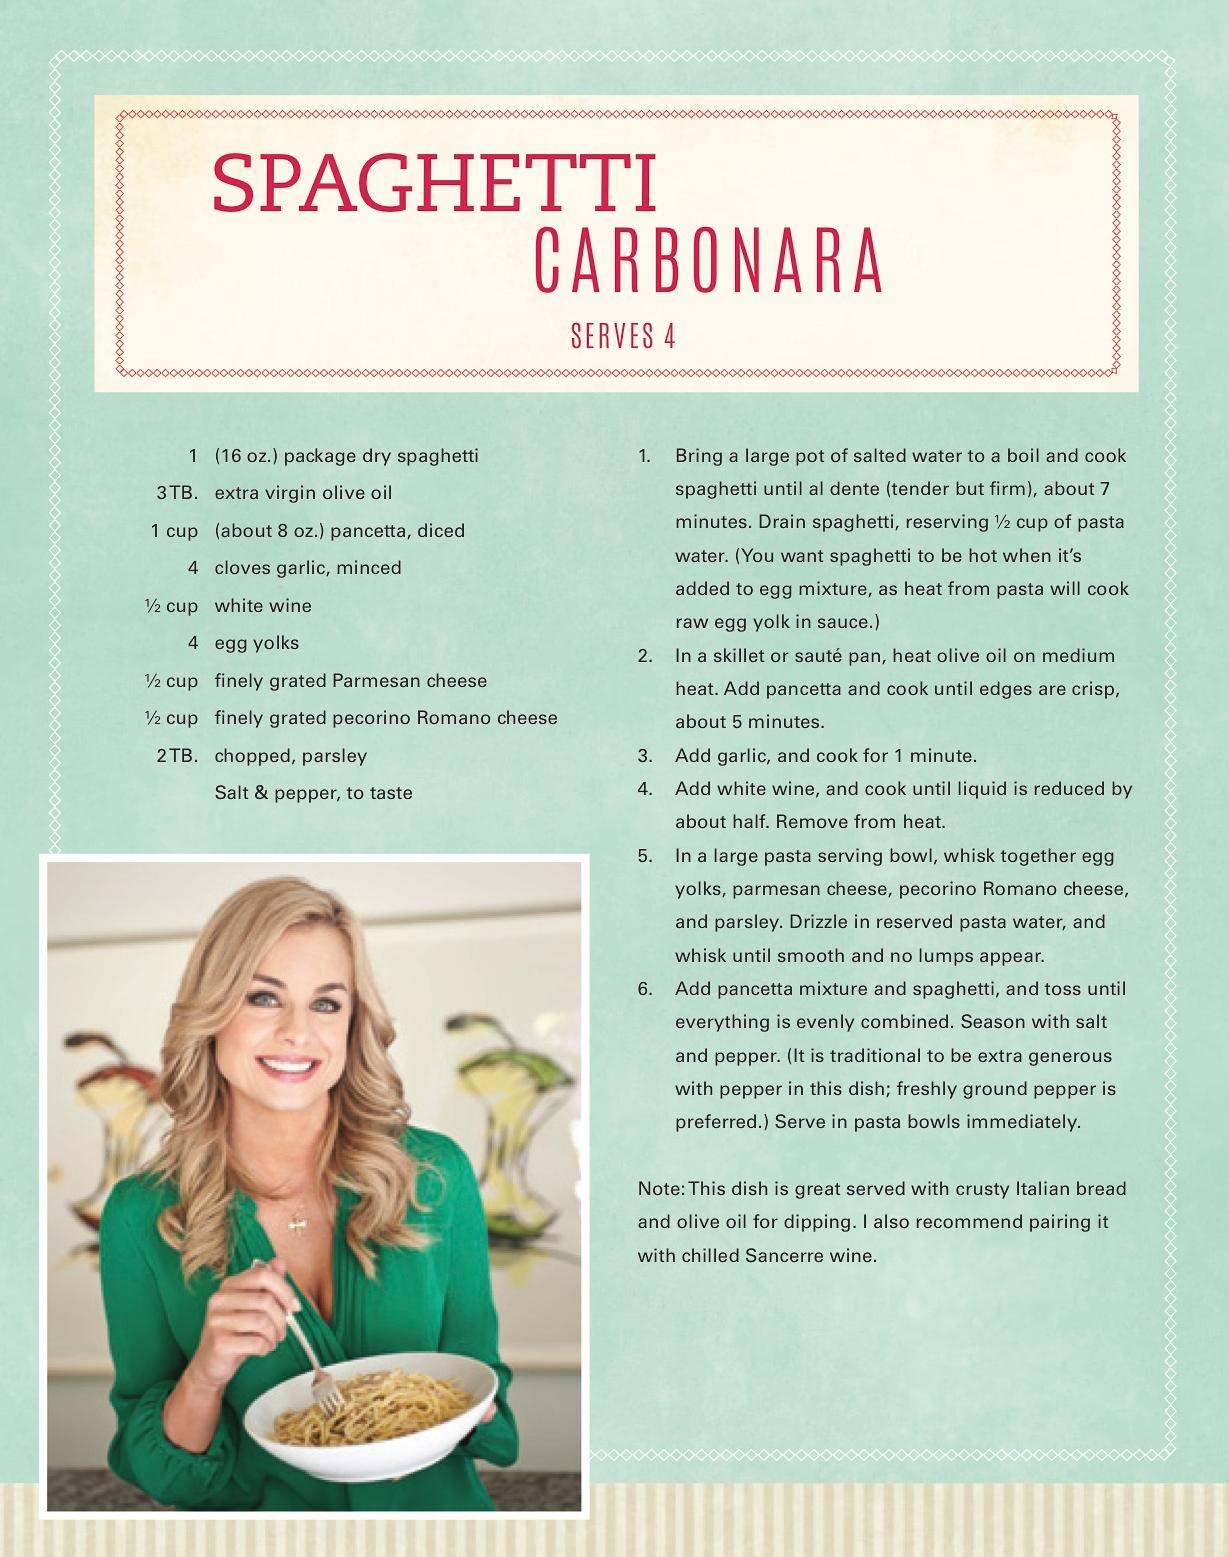 spaghetti-carbonara-italian-chef-jessica-collins.jpg